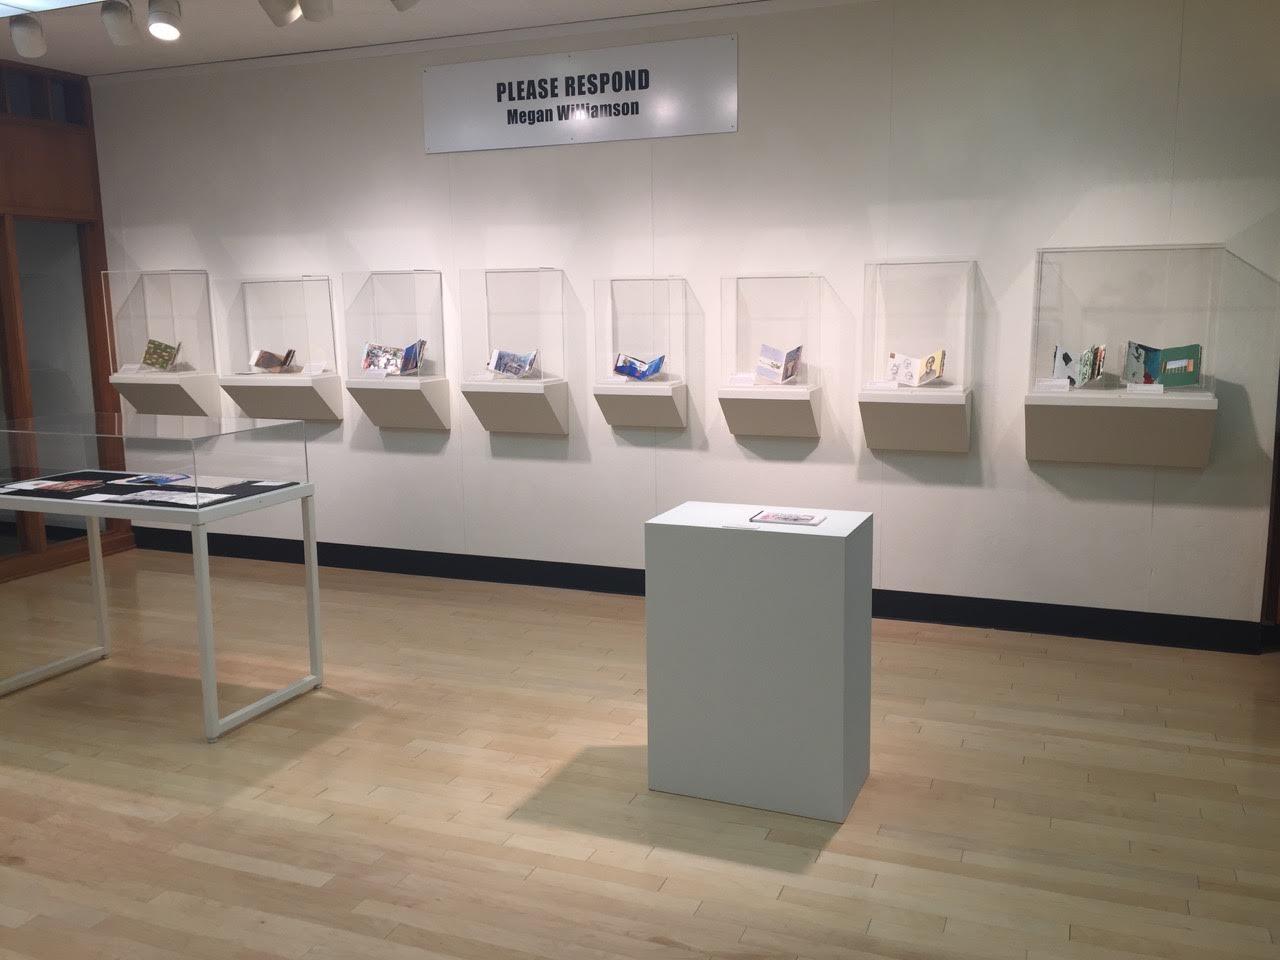 Please Respond Books exhibit at Ohio Wesleyan University (2017)